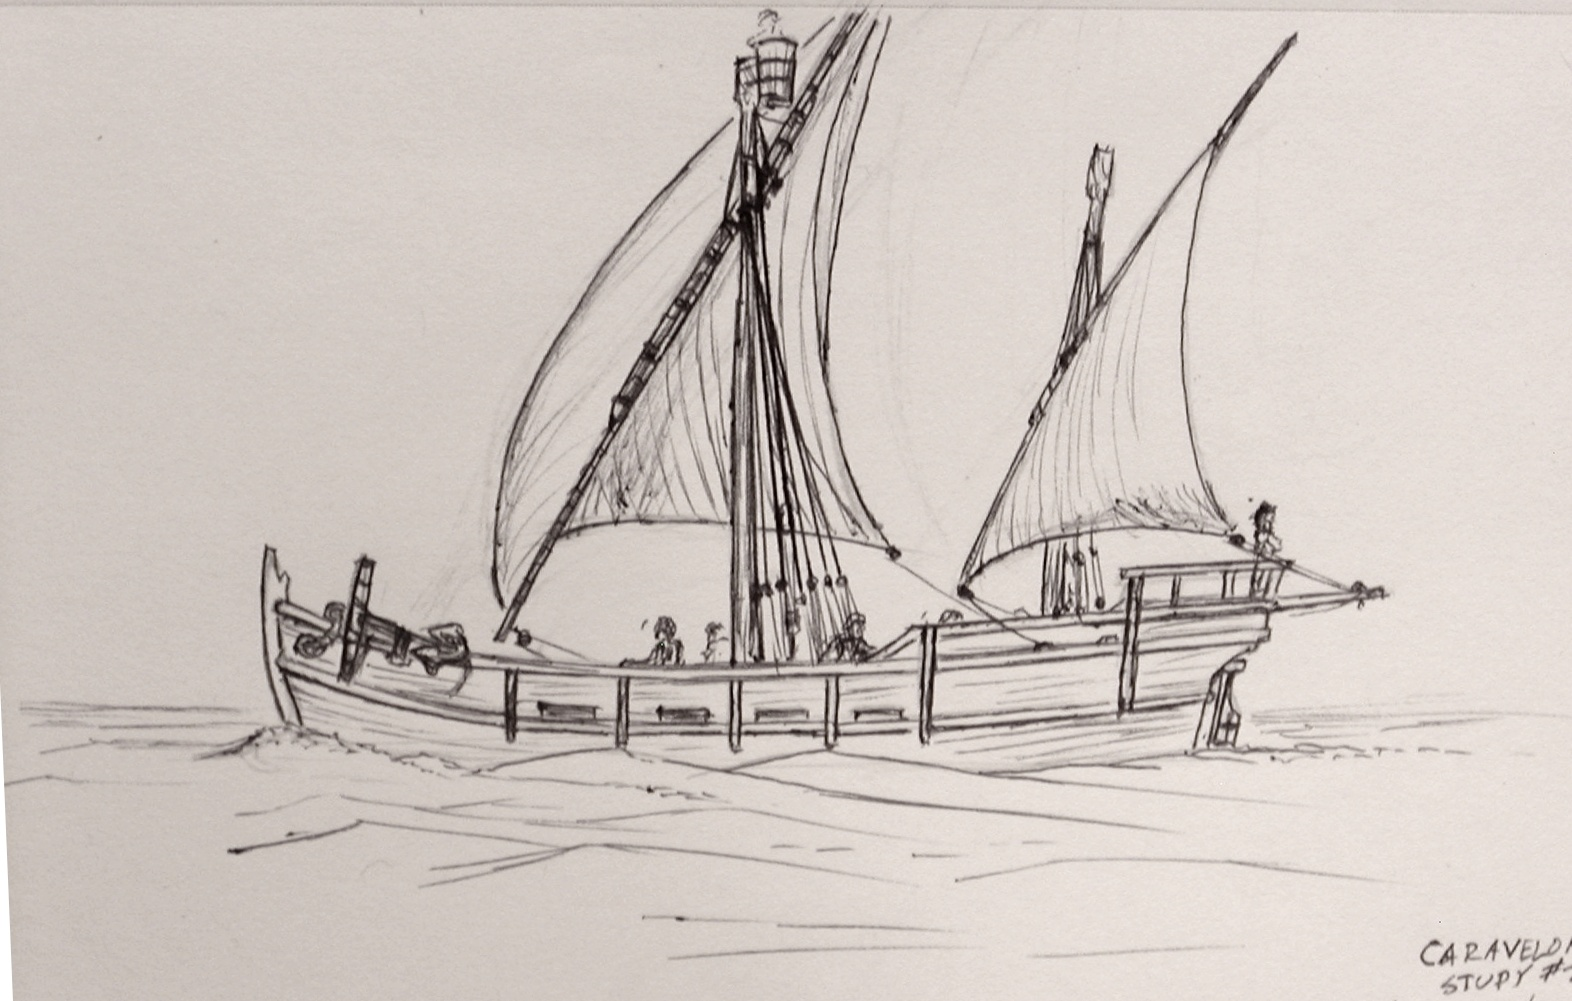 1572x1001 Robert's Old Ships The Caravelon